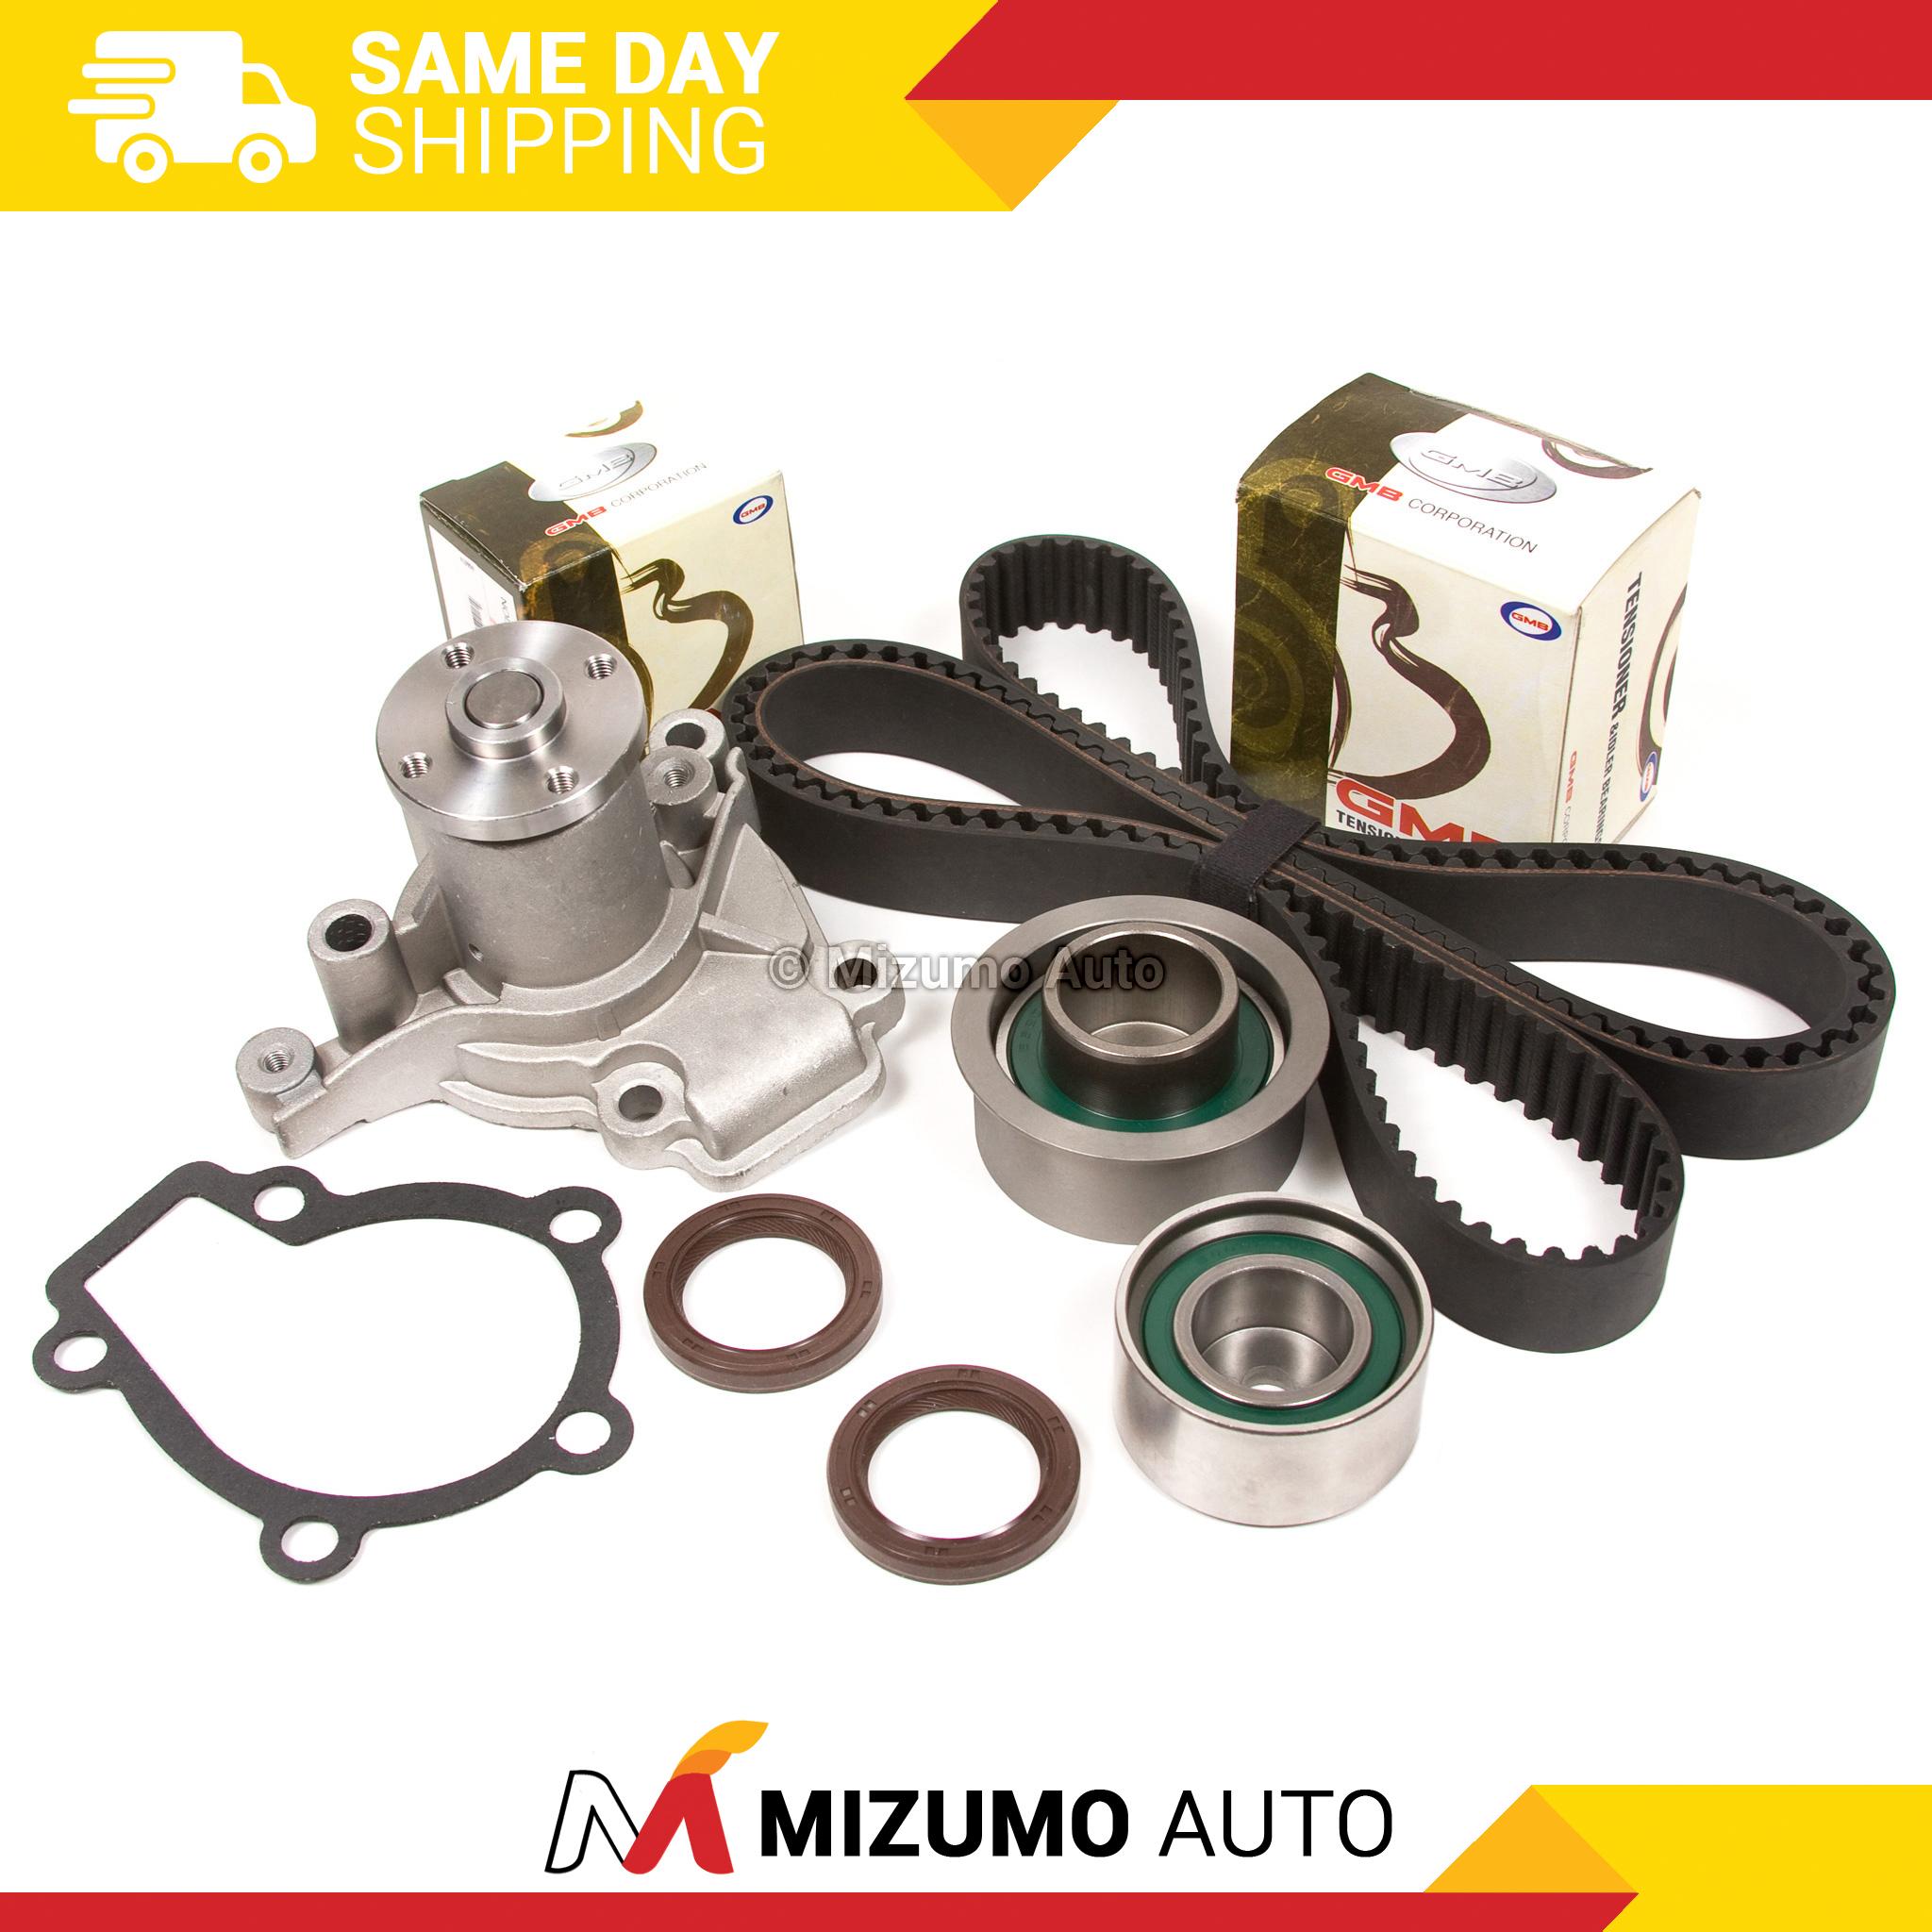 Timing-Belt-Kit-Water-Pump-Fit-Hyundai-Elantra-Kia-Sportage-Spectra-2-0L-G4GF